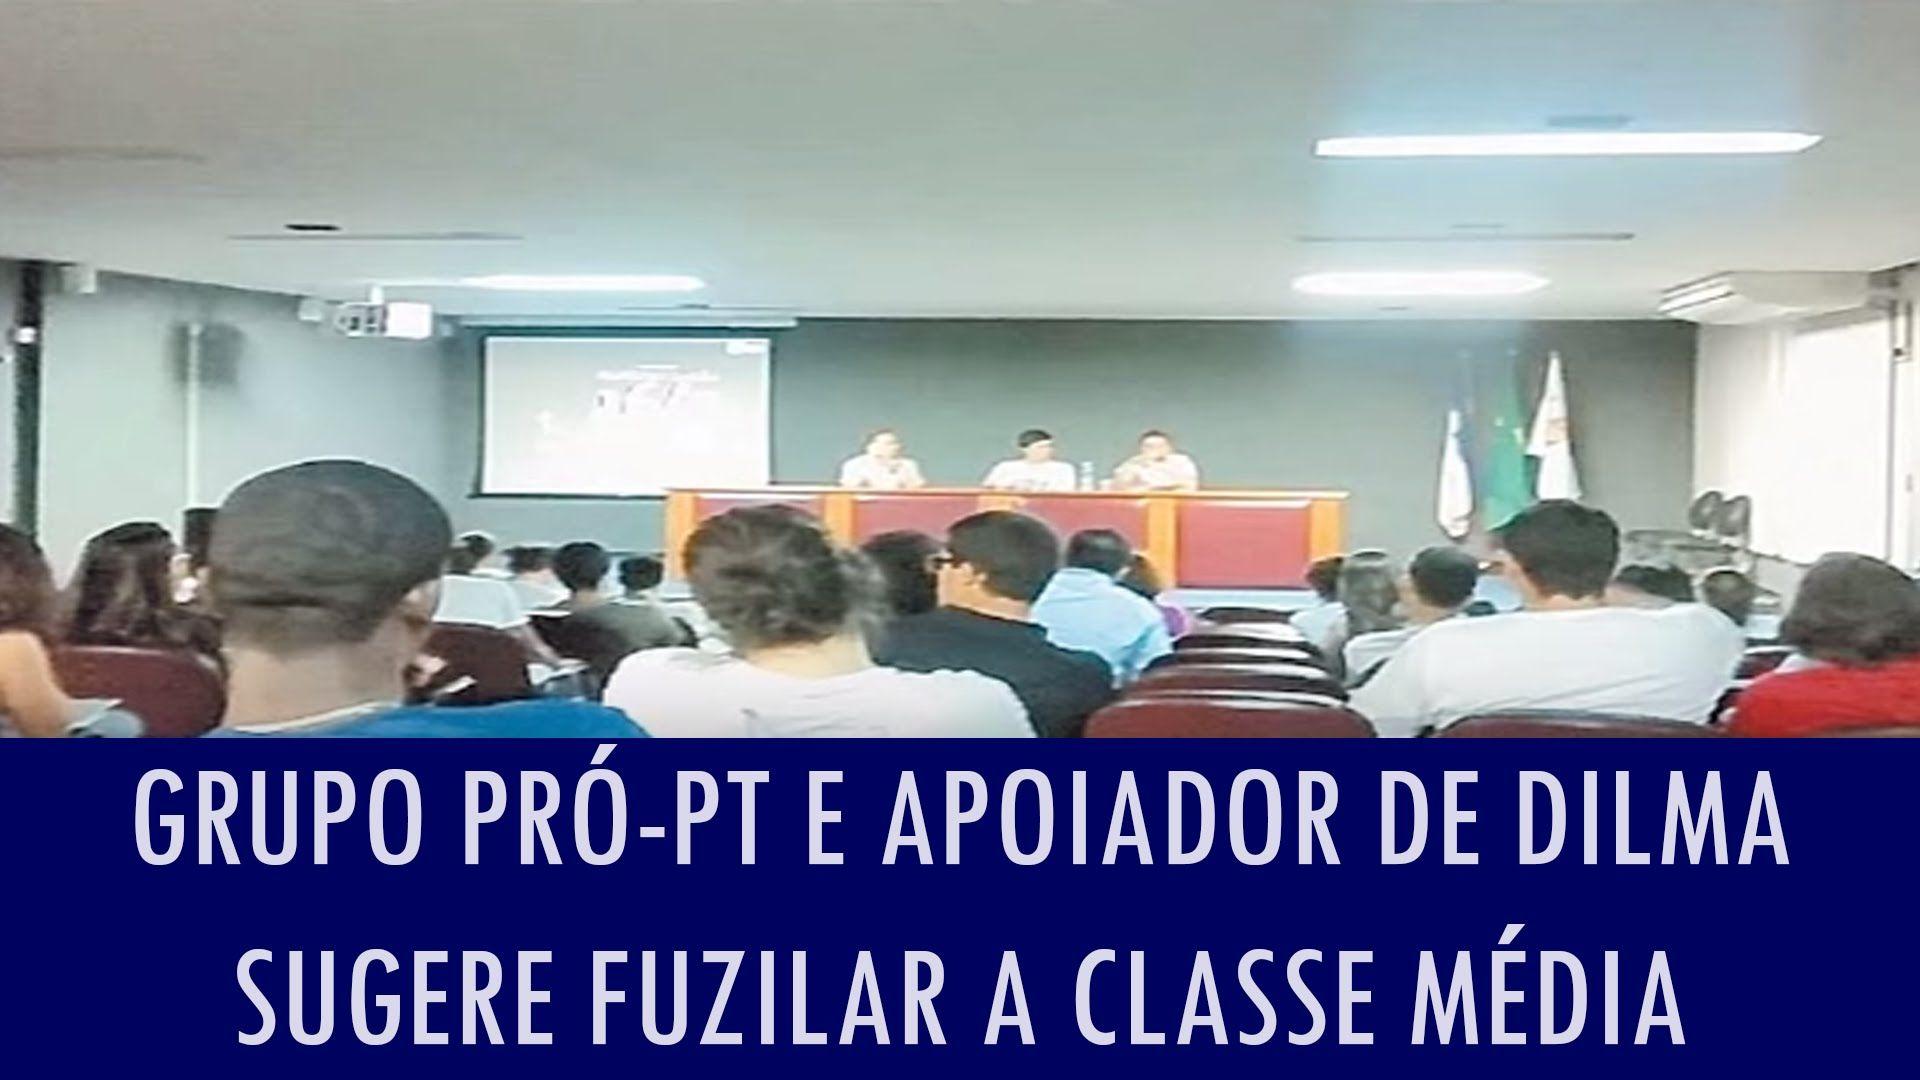 Grupo pró-PT e apoiador de Dilma sugere fuzilar a classe média